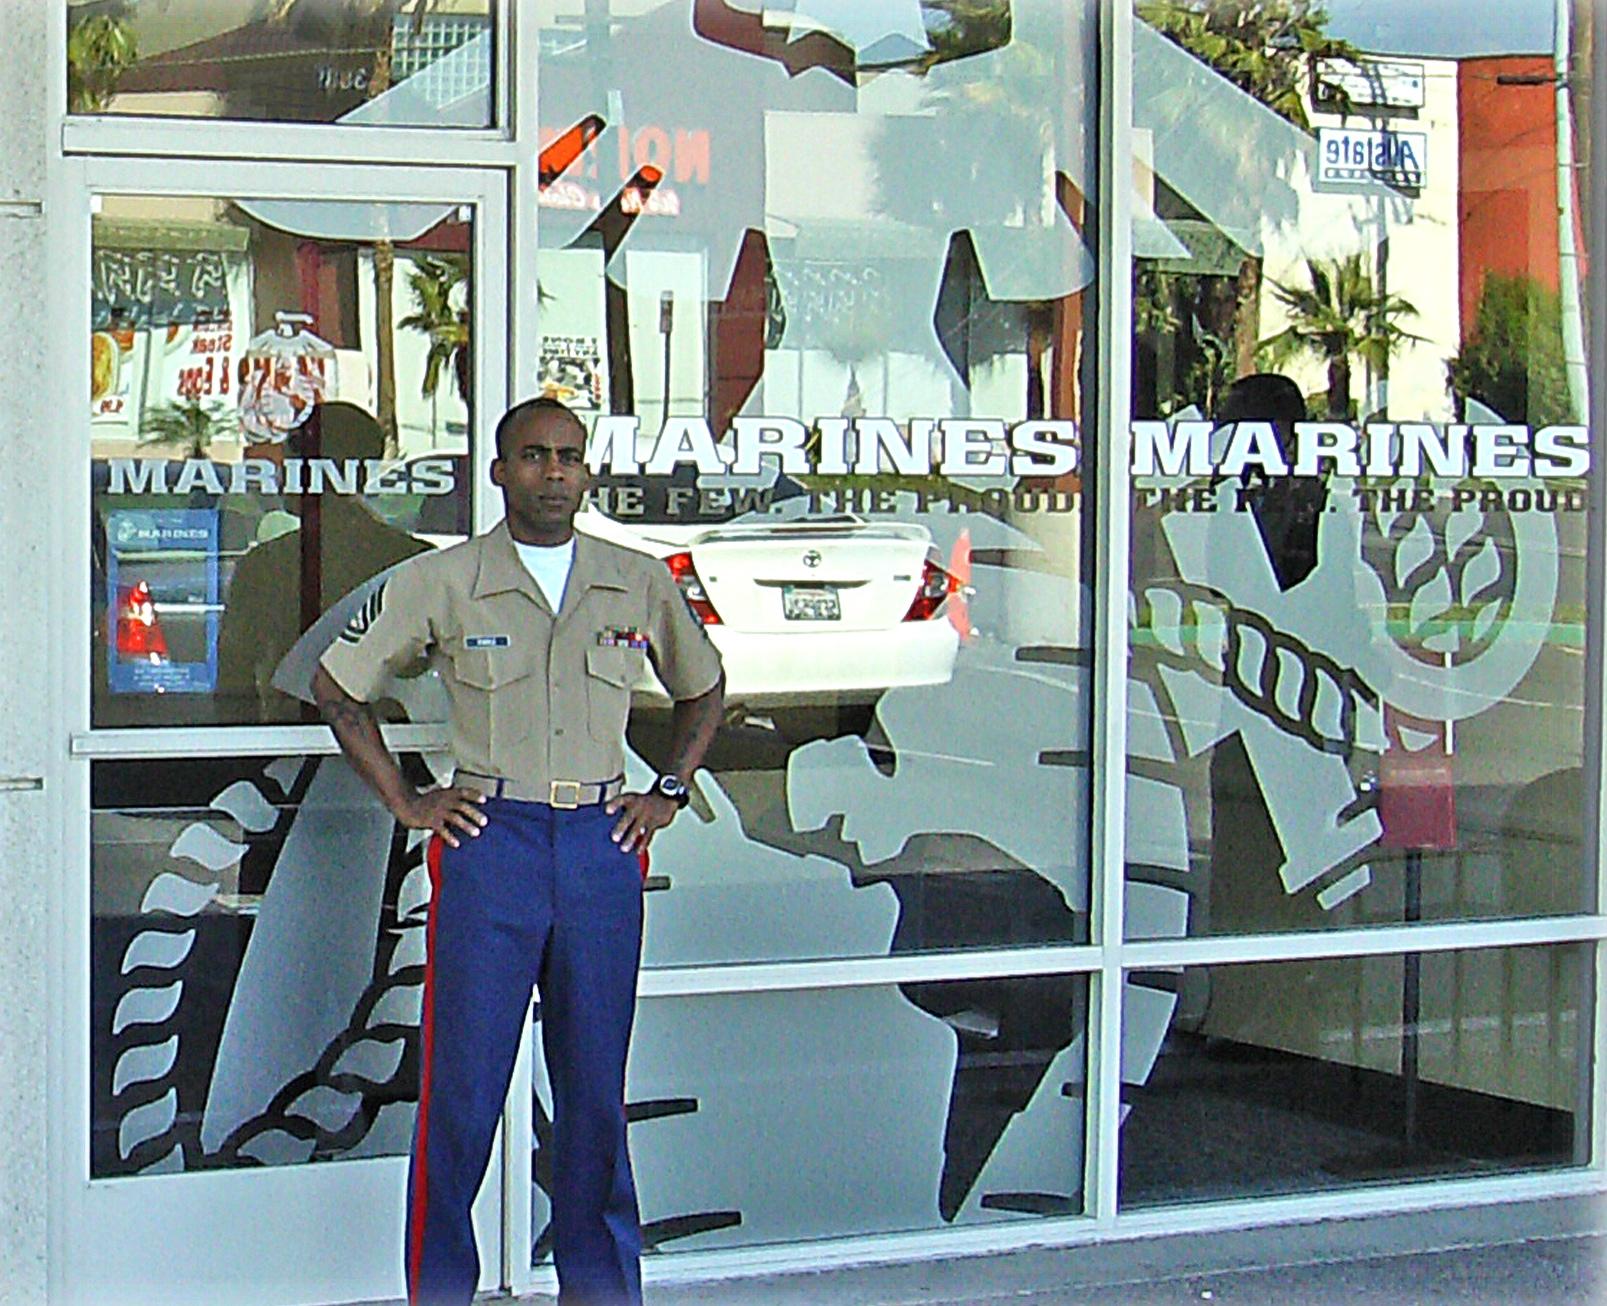 Marines Recruiting custom vinyl window graphics